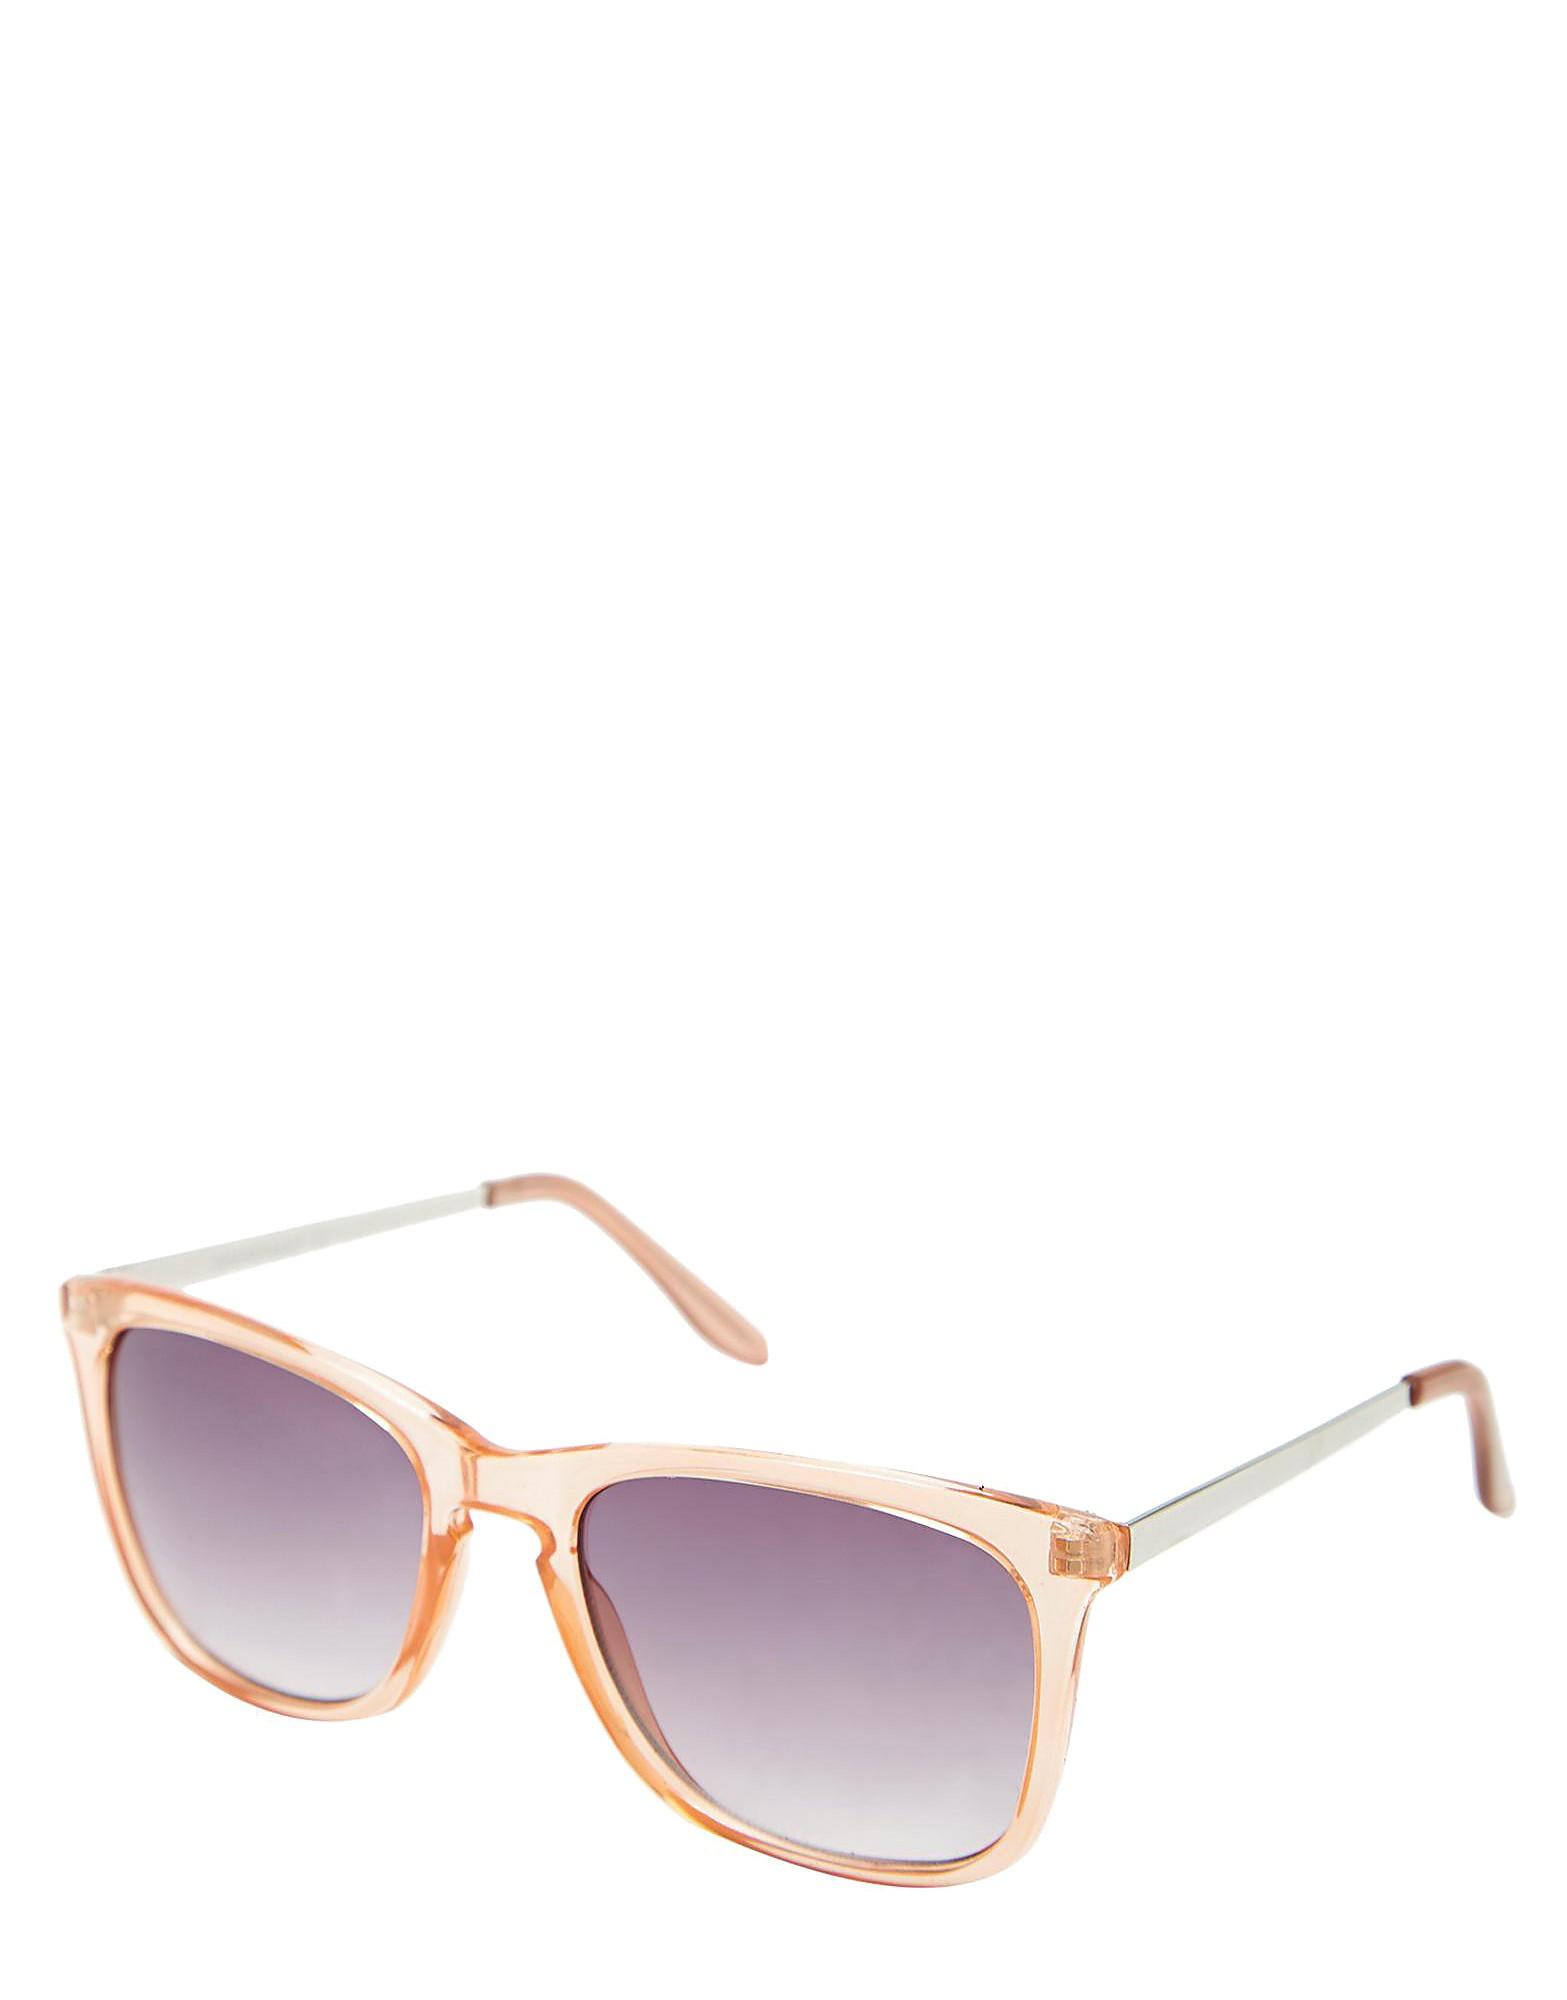 Brookhaven Poppy Sunglasses